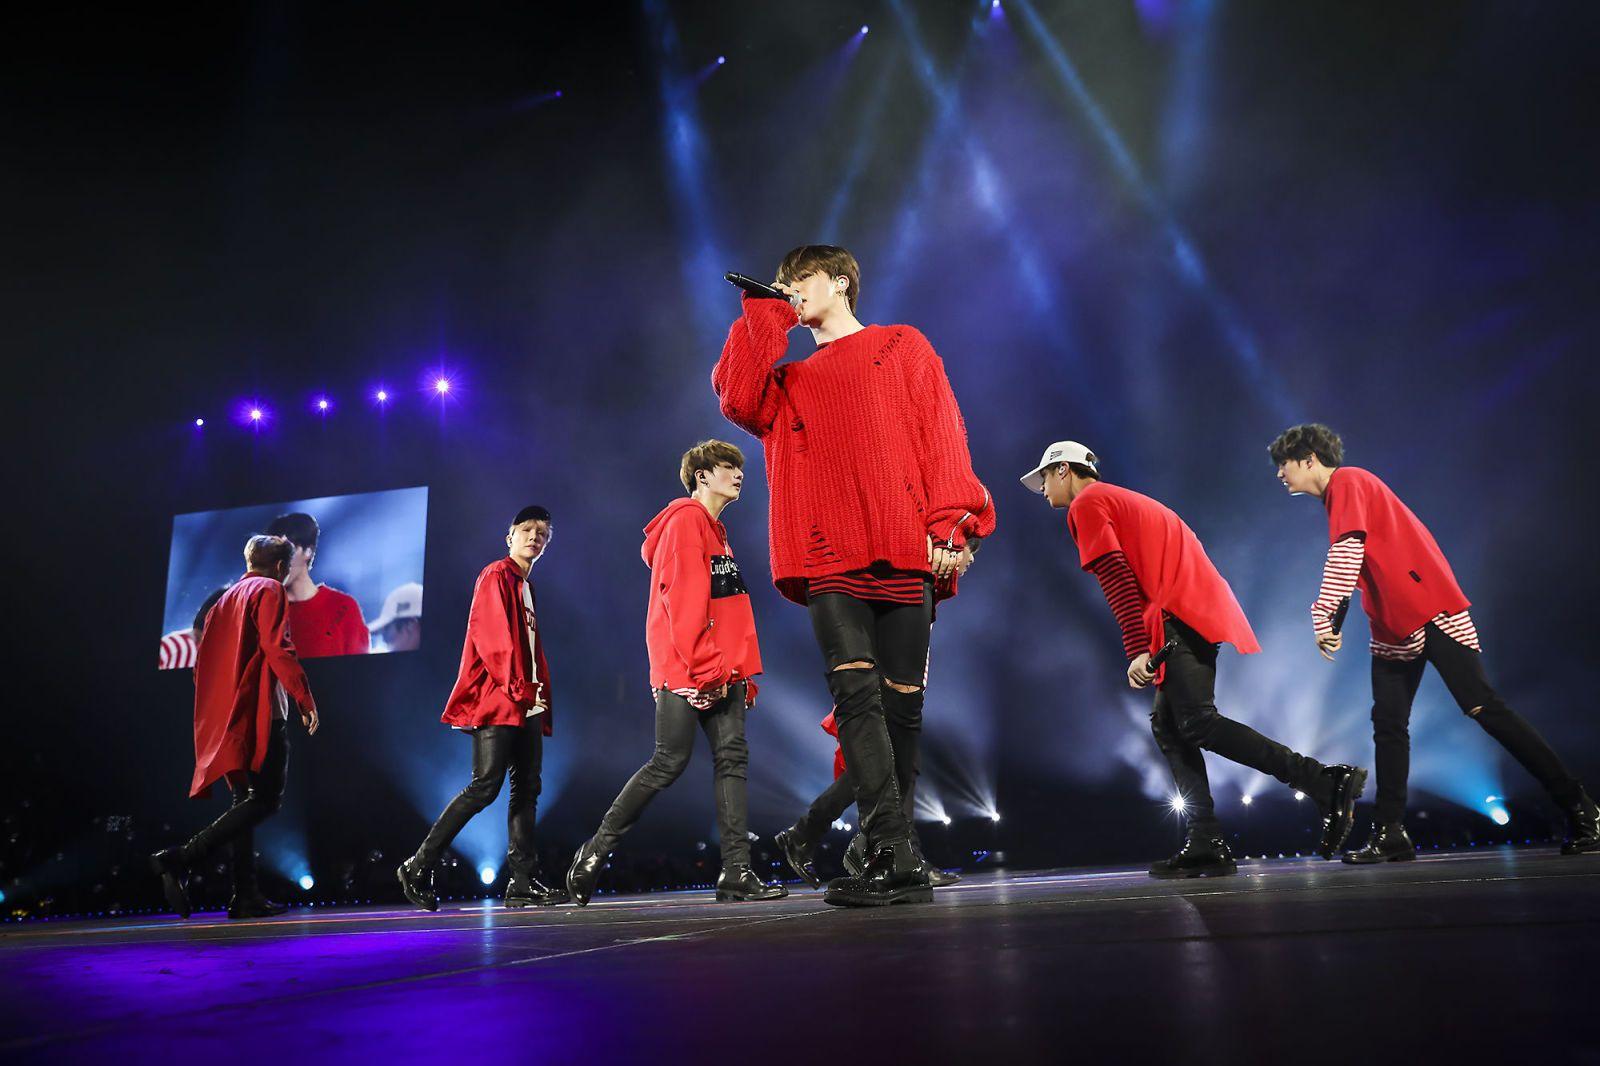 Resultado de imagem para bts performing on stage